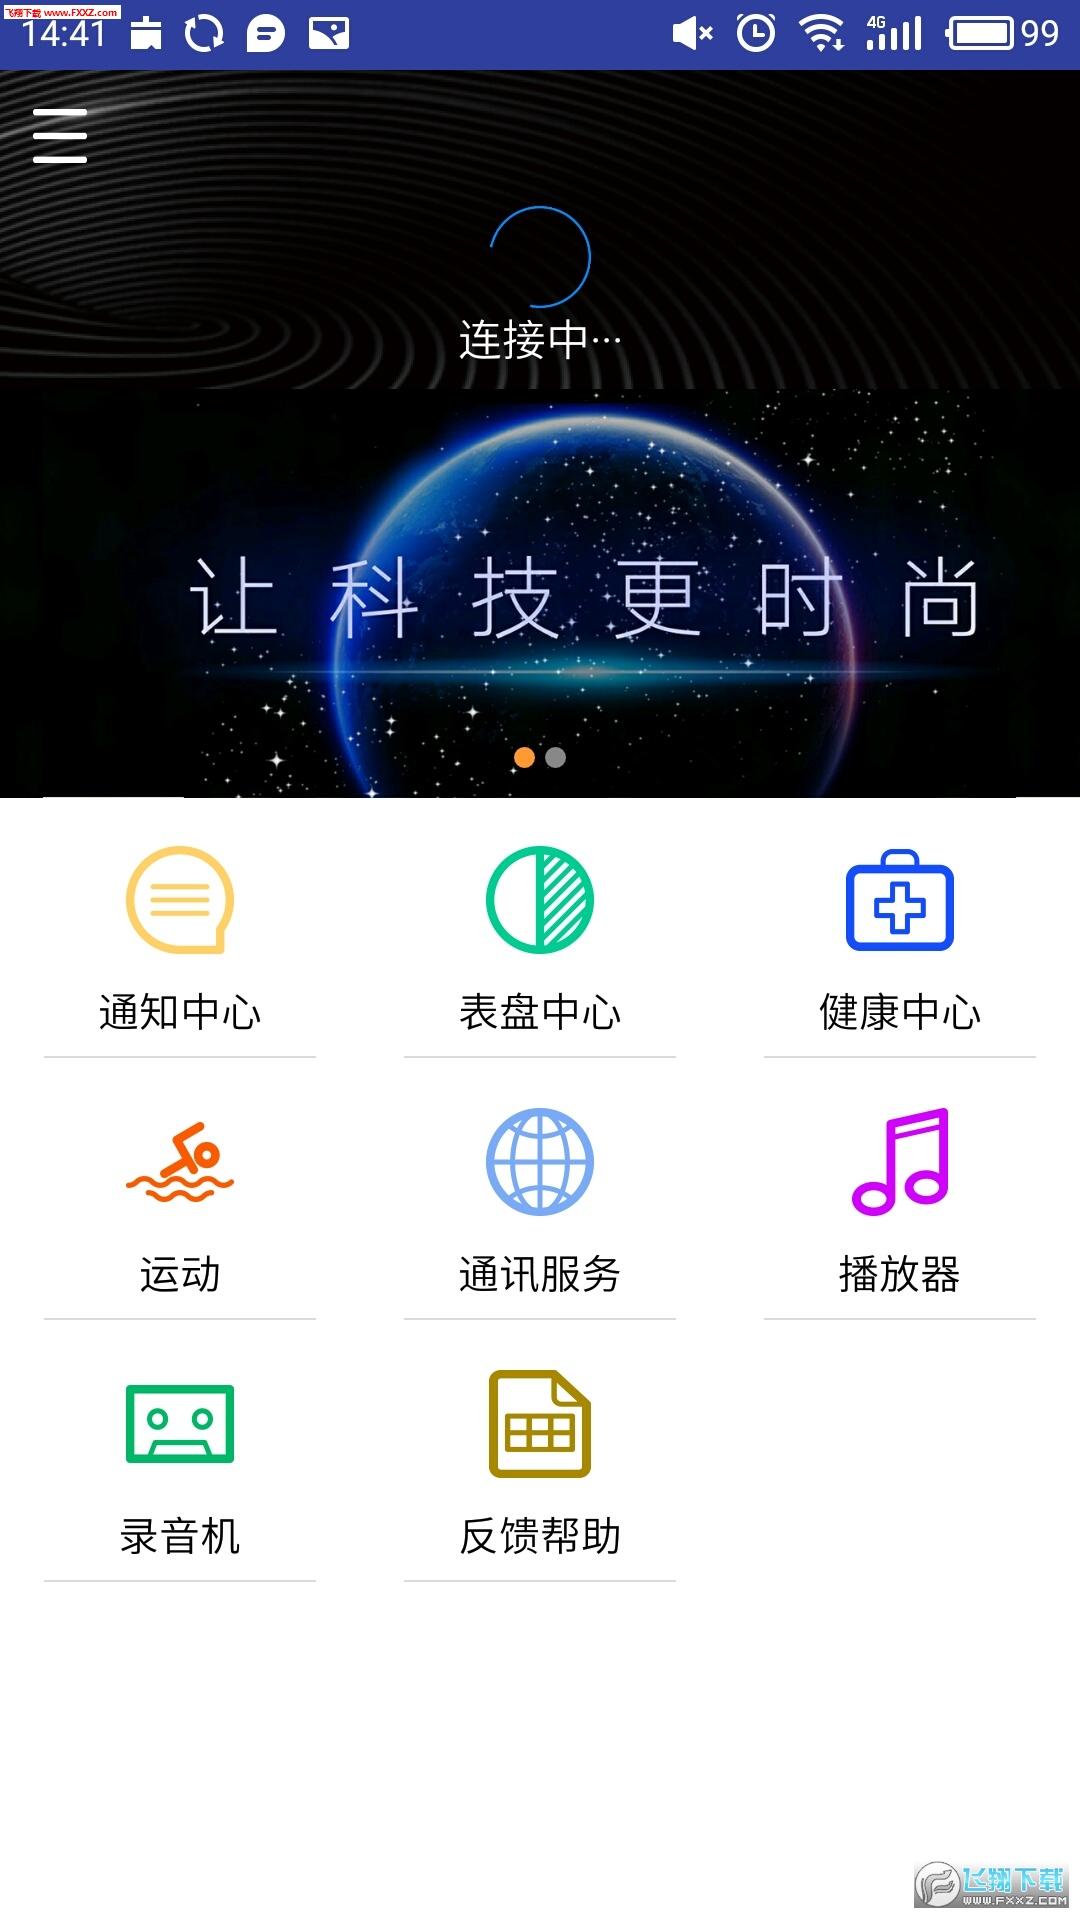 喵星手表appv9.0.4.1截图1